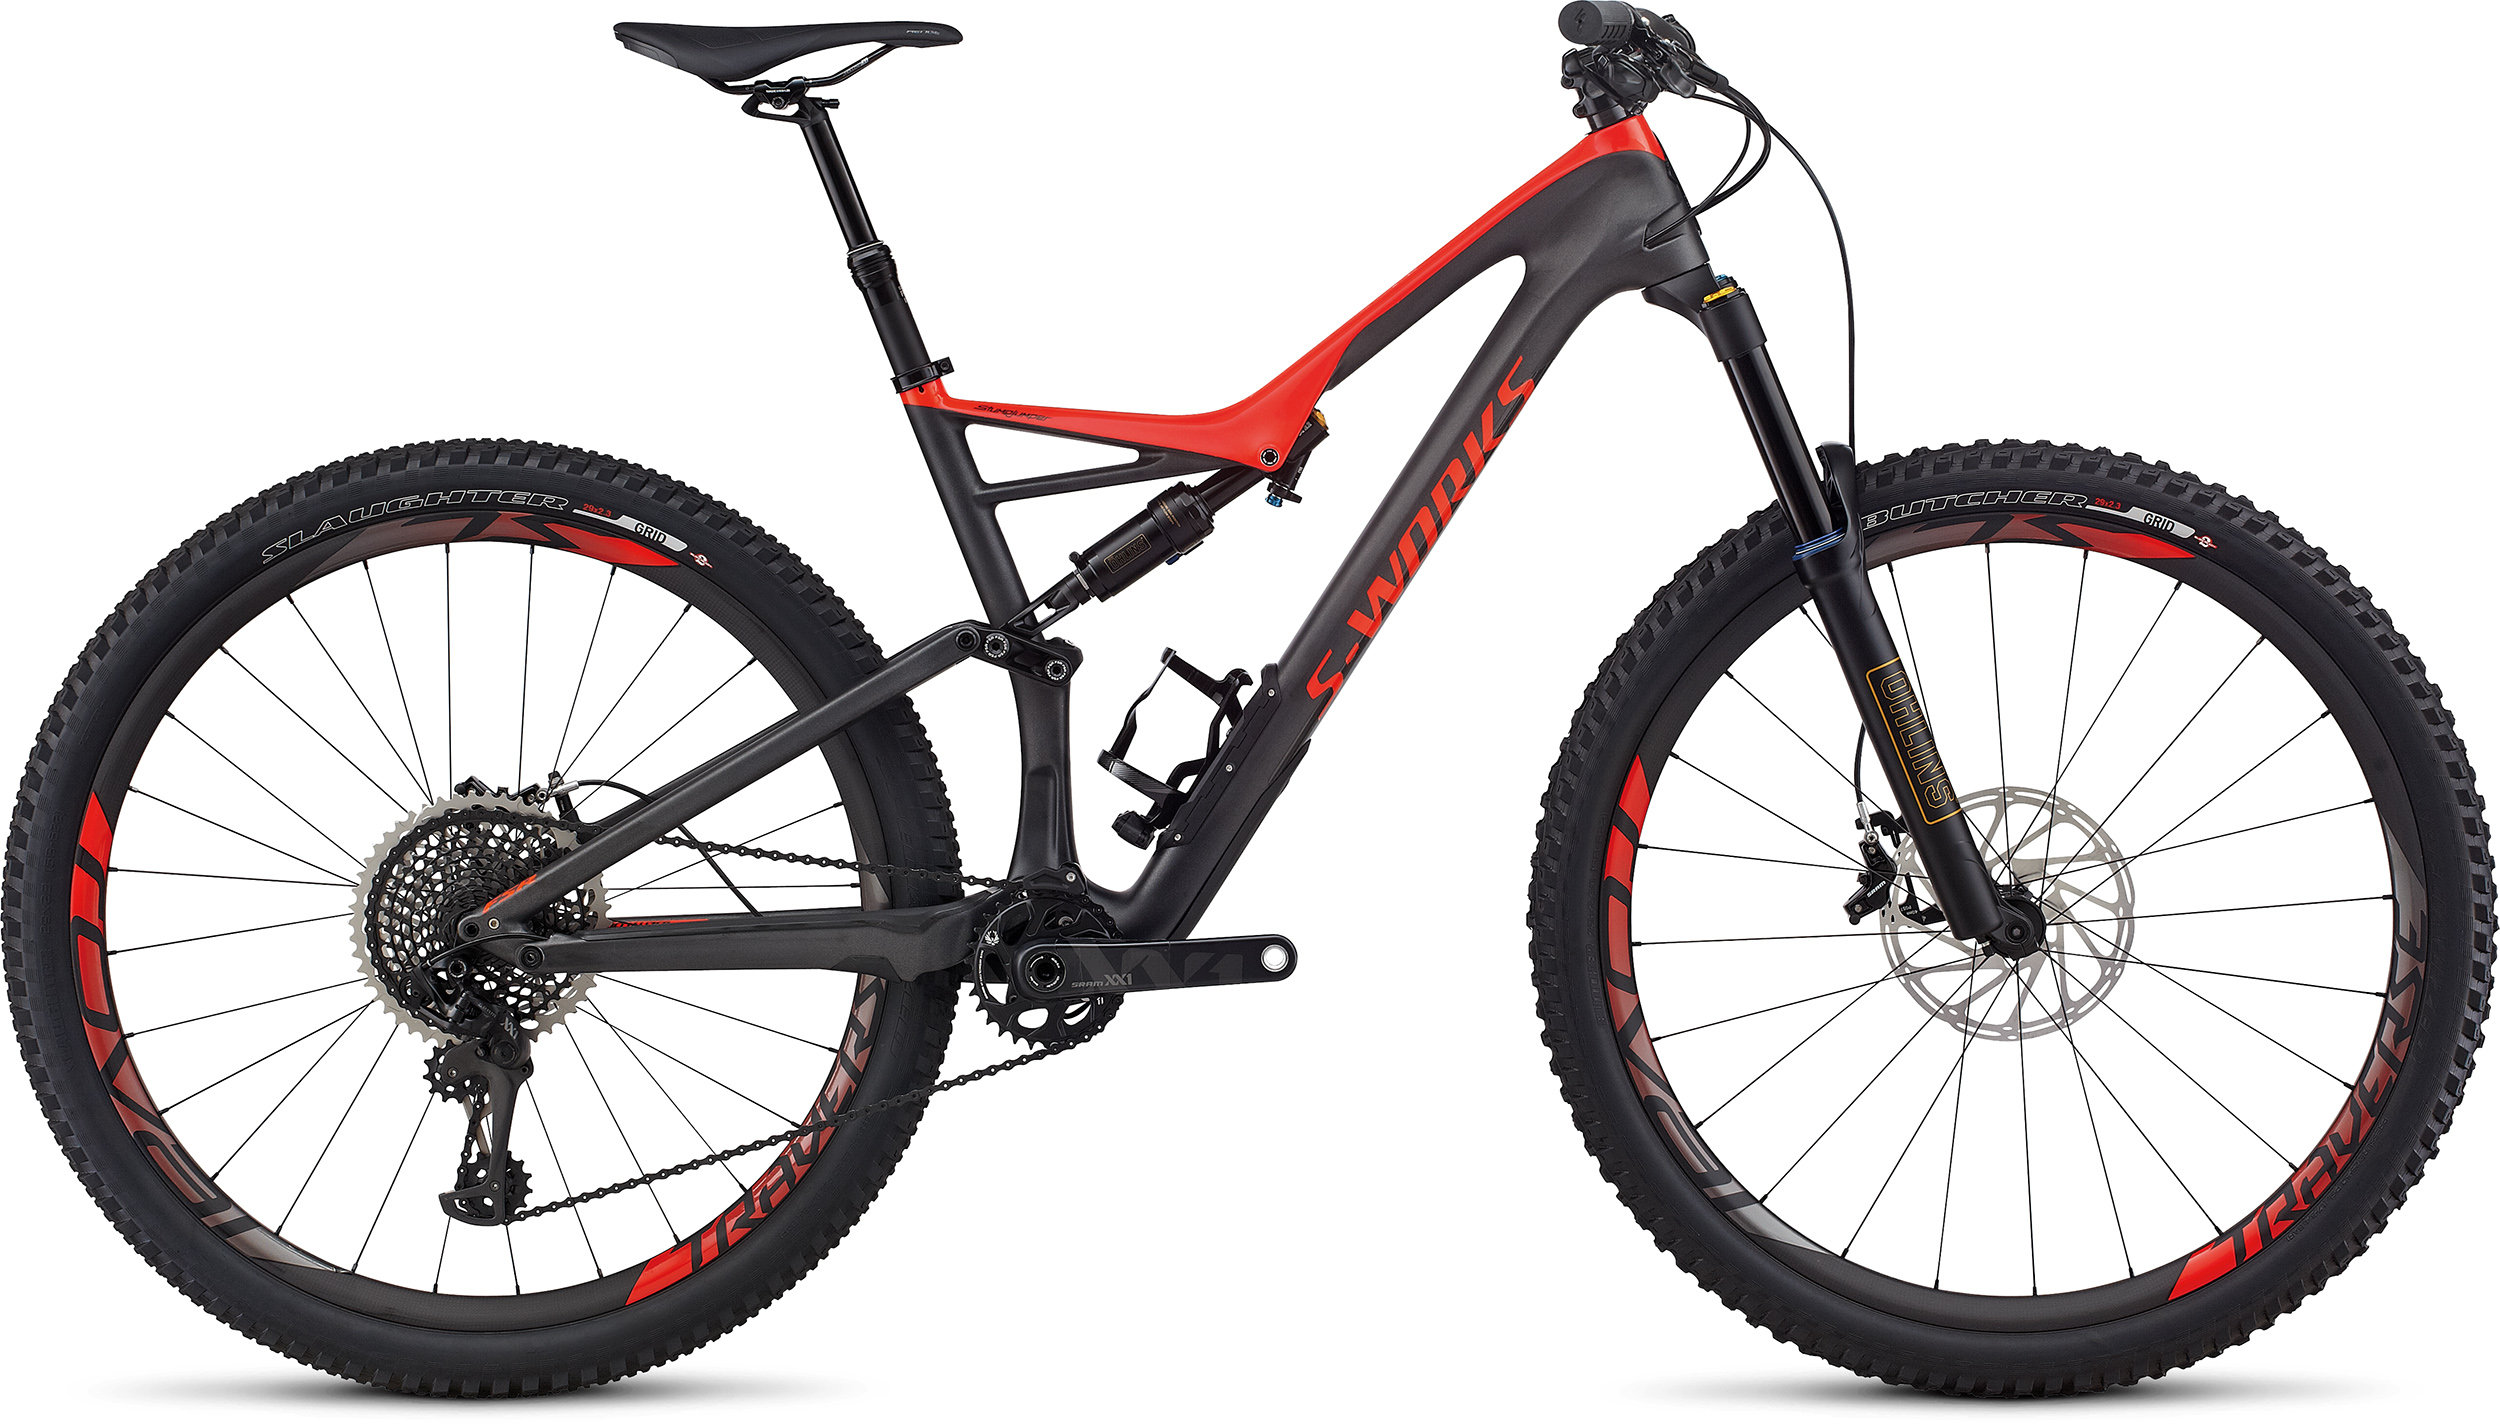 SPECIALIZED SW SJ FSR CARBON 29 SILTNT/RKTRED L - Pulsschlag Bike+Sport